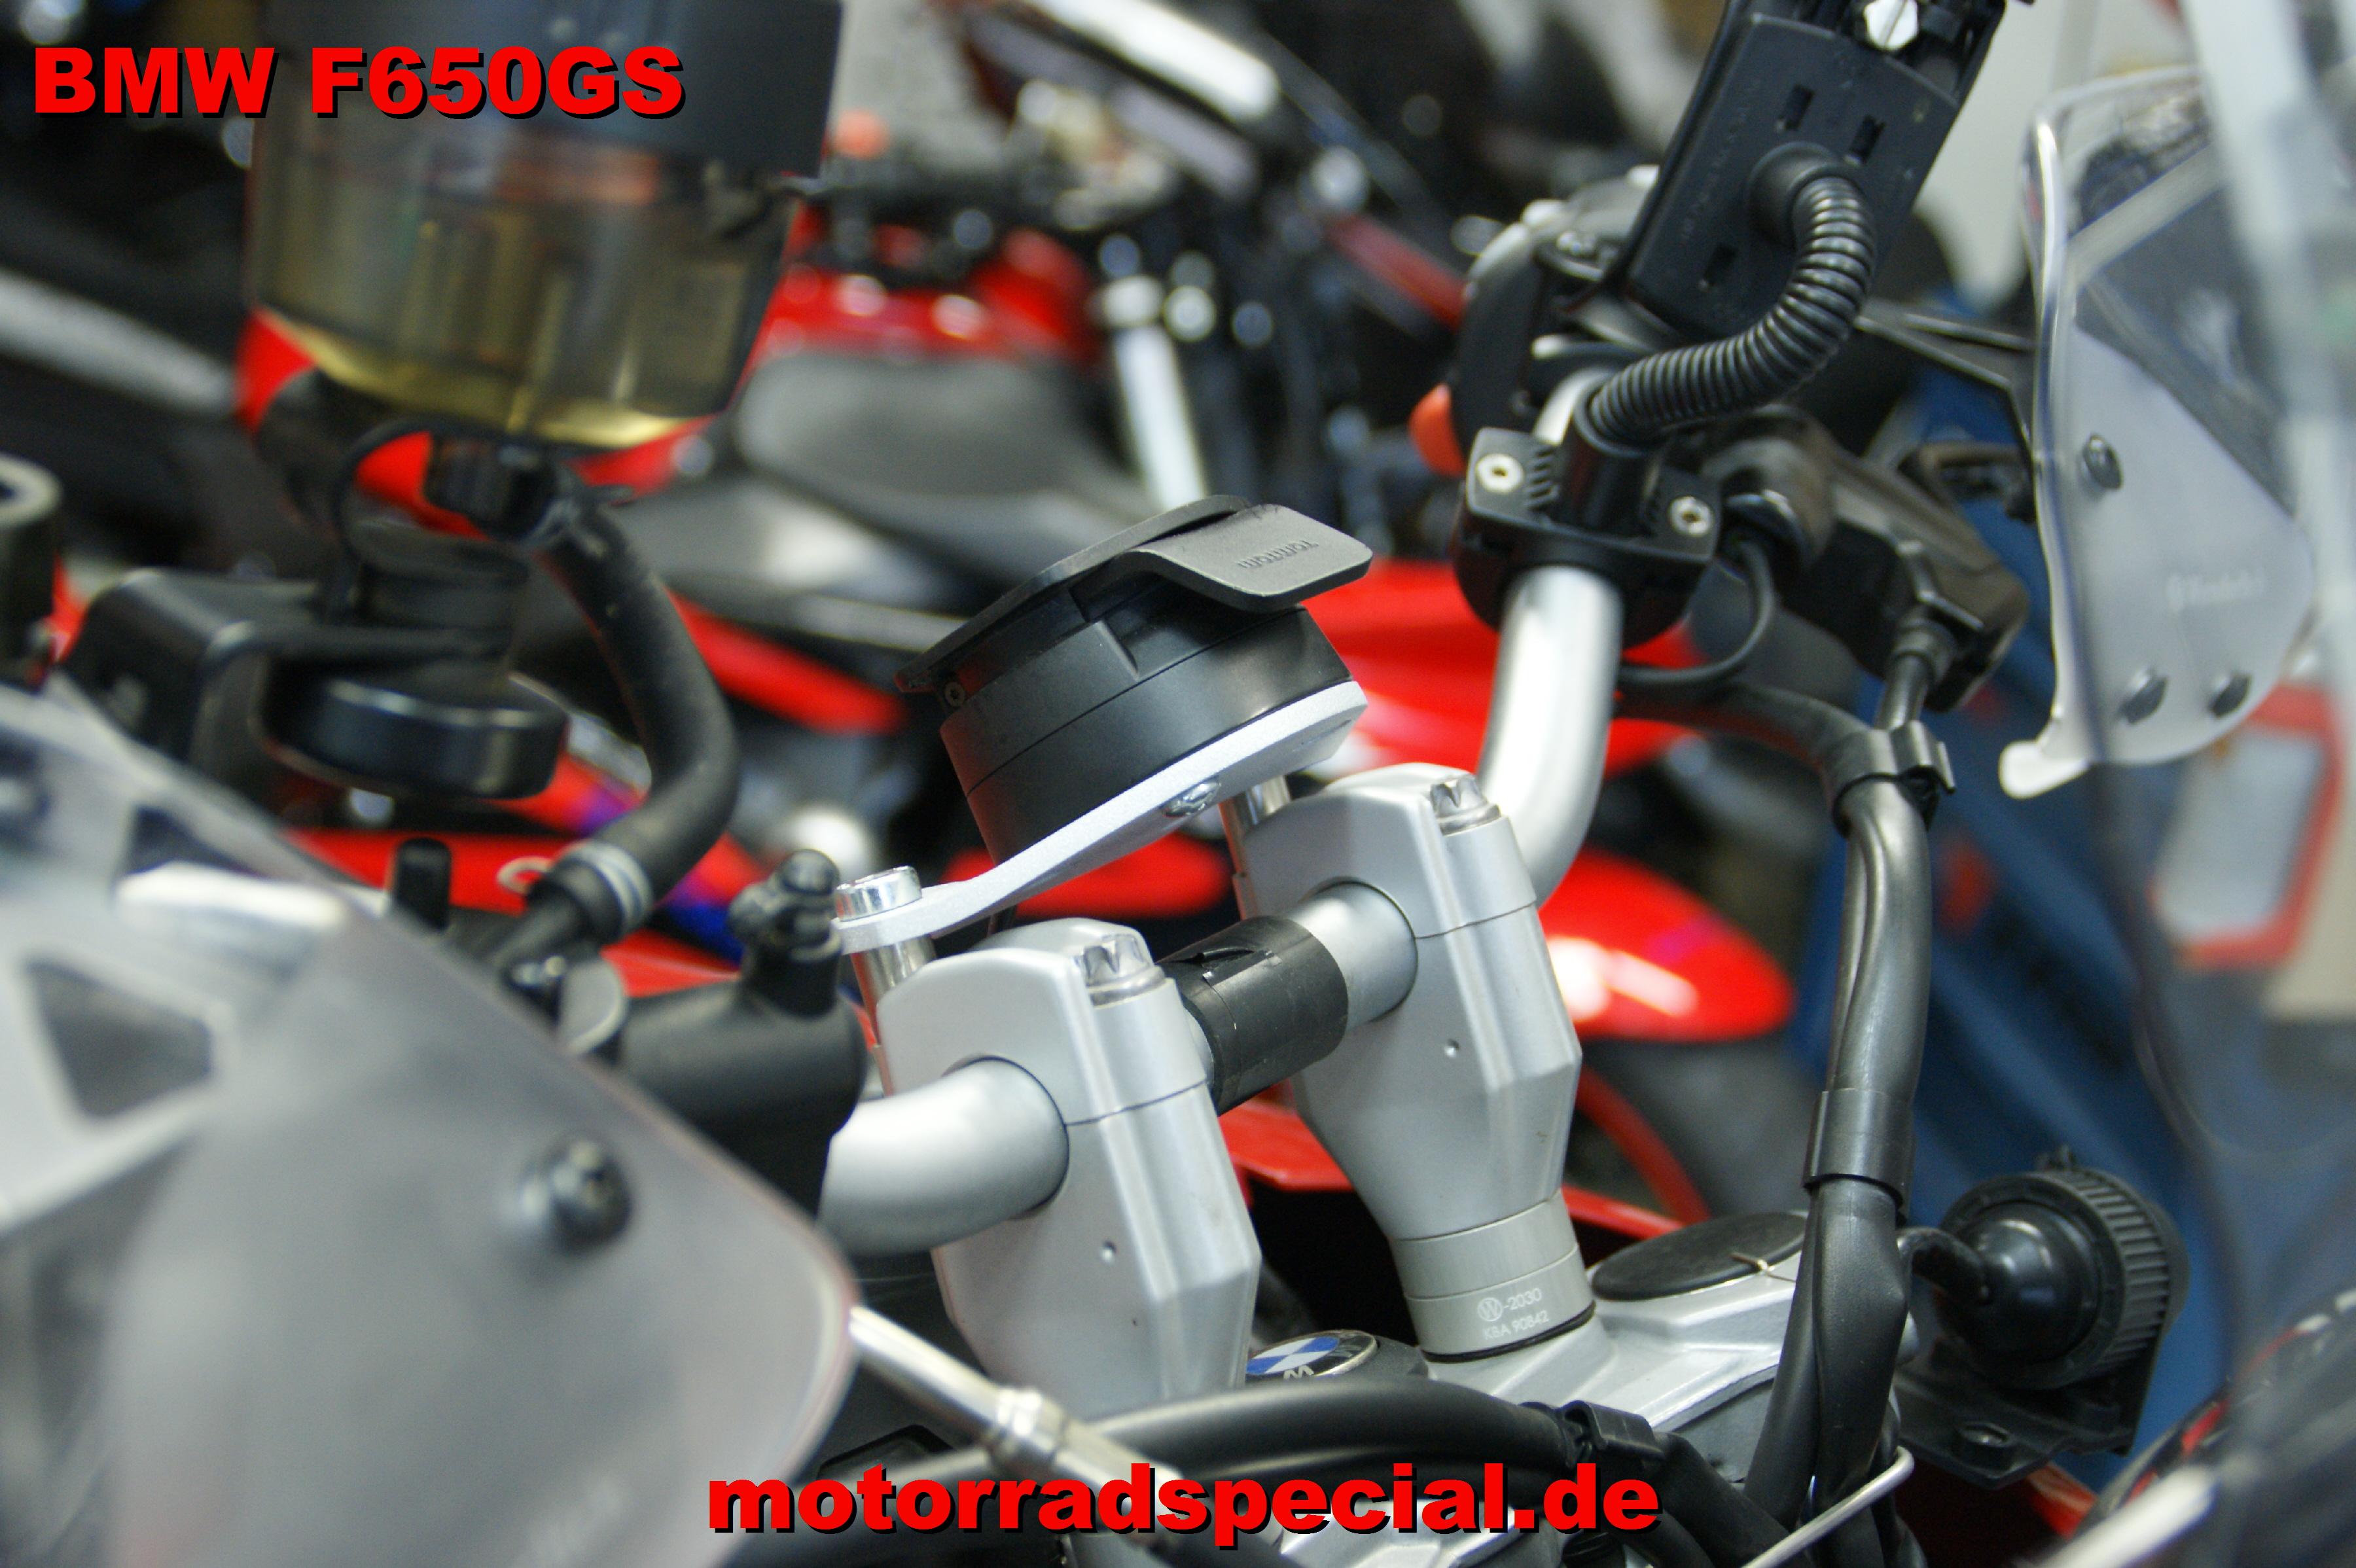 BMW_F650GS_Navigationshalterung_Navihalter_TomTom Rider_400_410_3